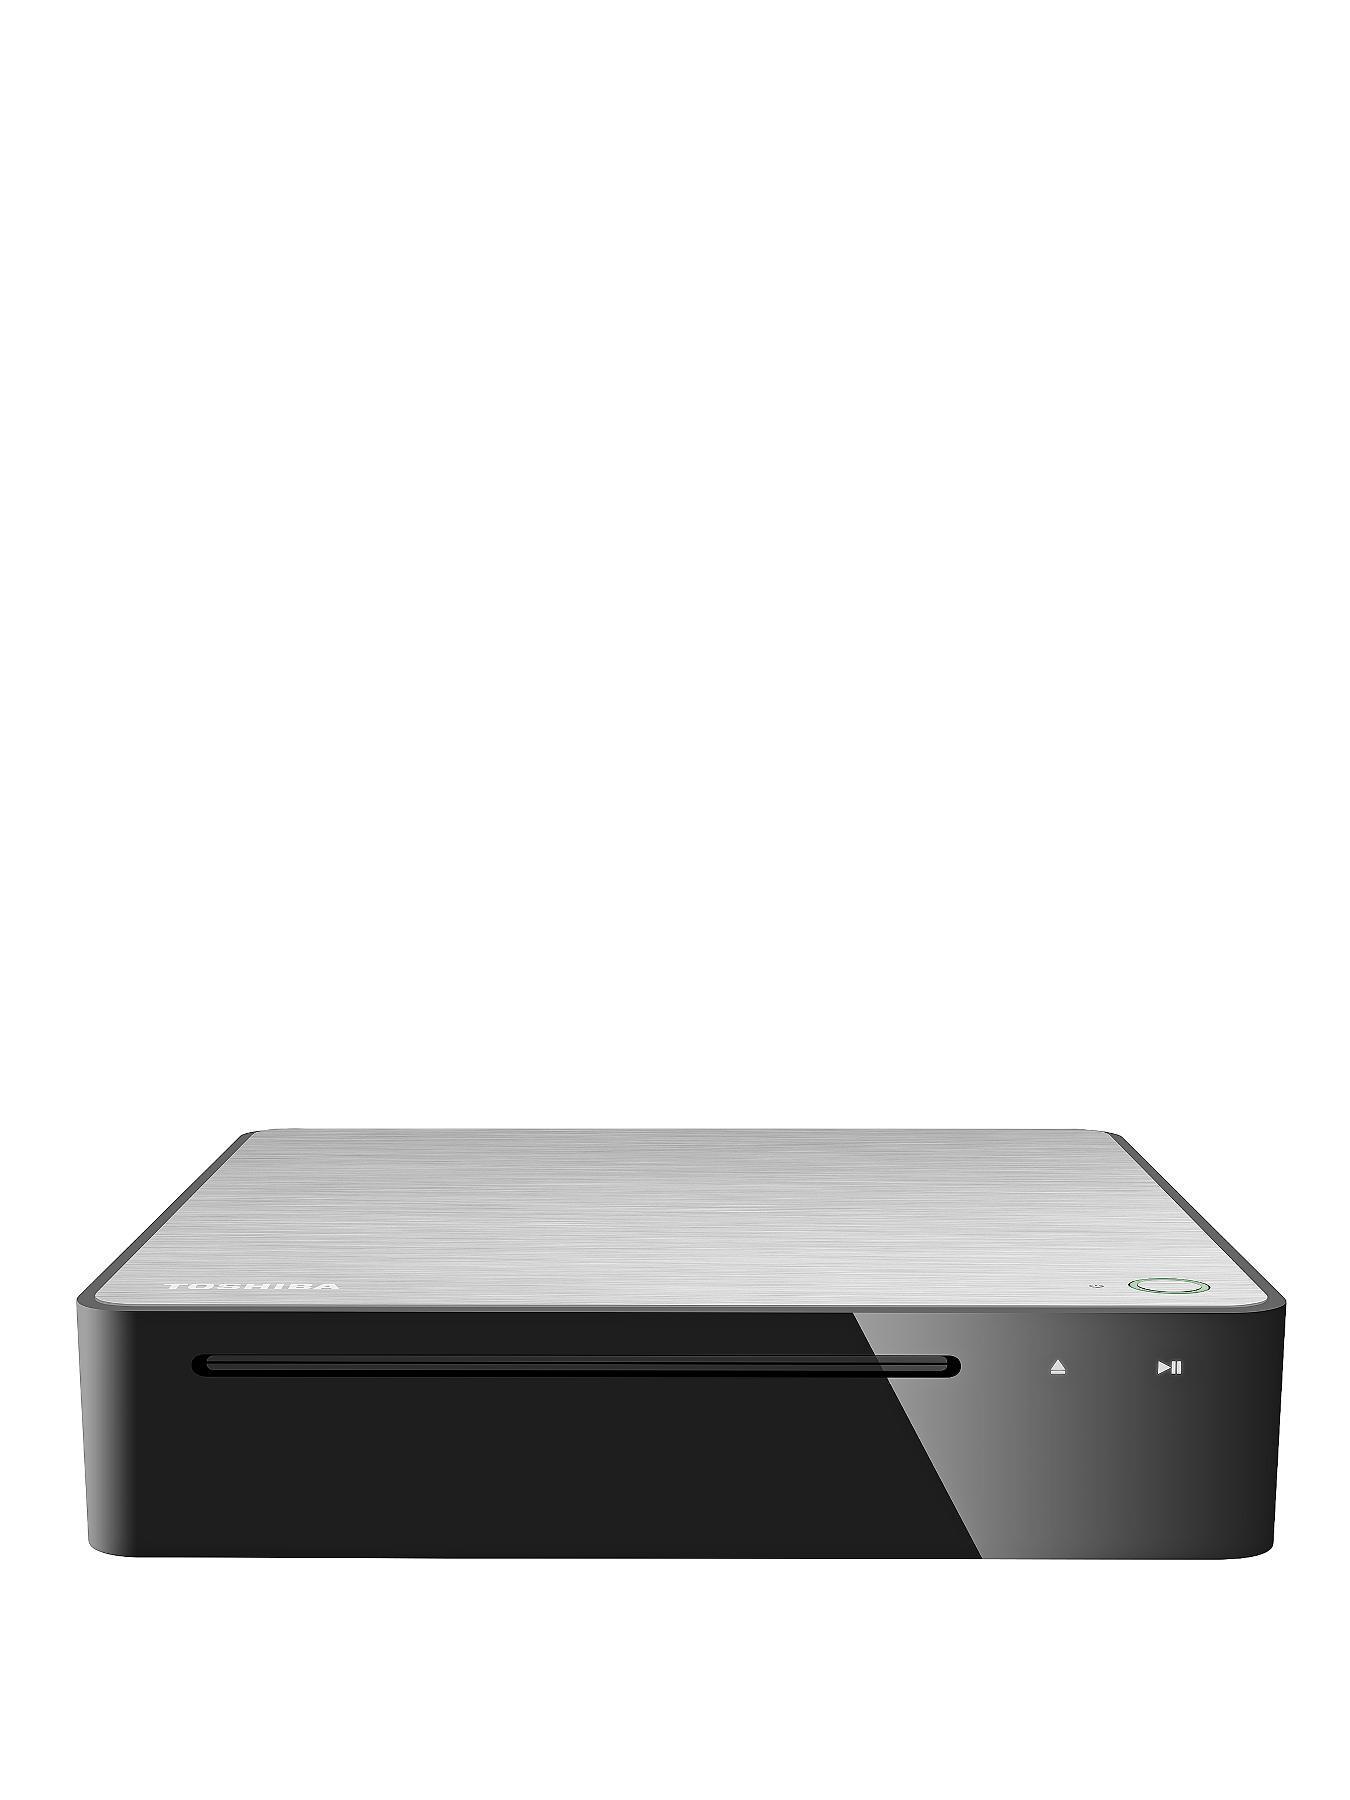 Toshiba BDX5500KB Smart 3D Blu-ray Player